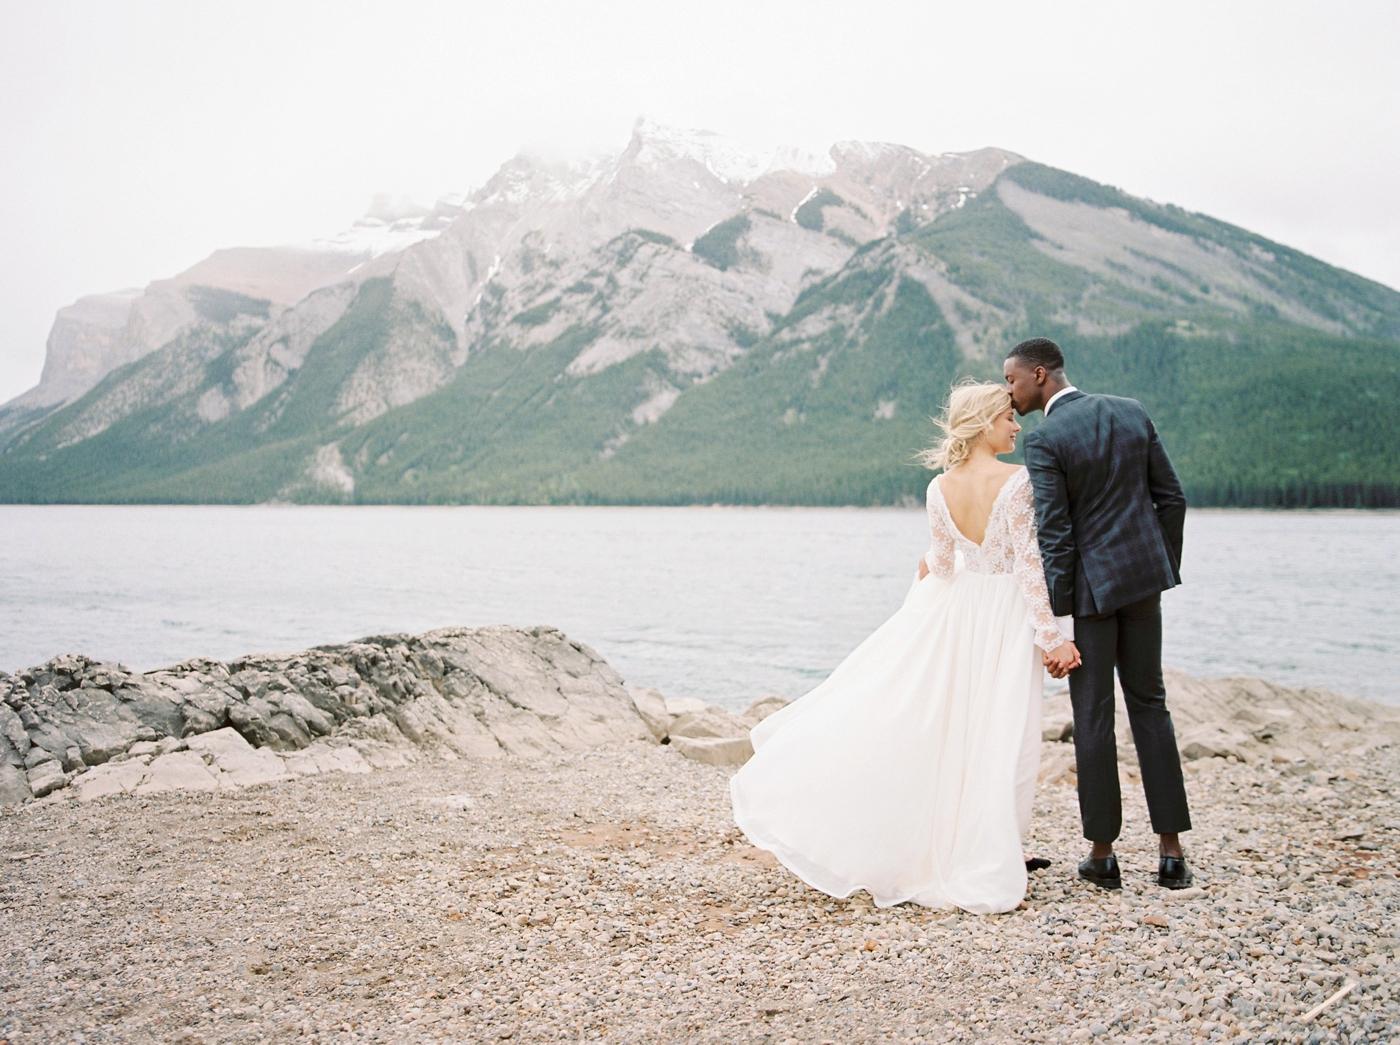 Stacey Foley Design Joy Wed Fine Art Series Photography Workshop | Banff wedding photographers | Rimrock resort wedding | bride and groom portraits lake minnewanka banff wedding photographers